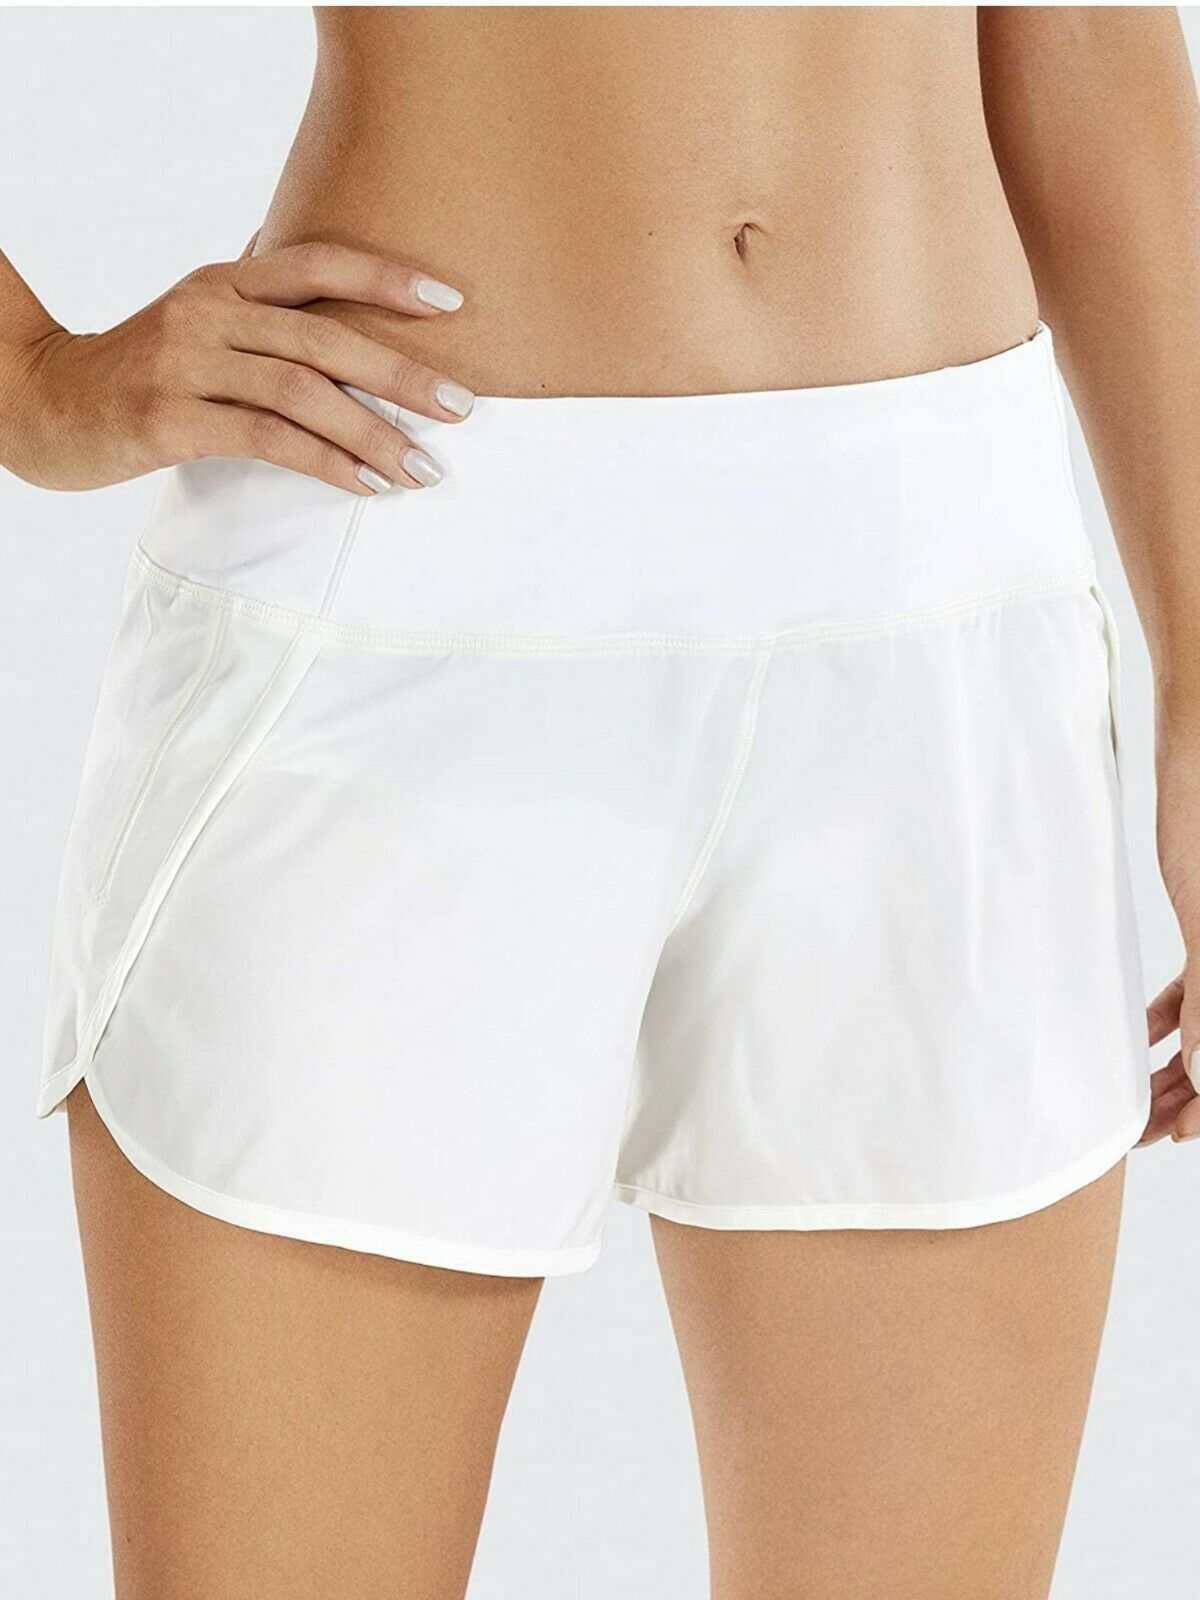 CRZ YOGA Women's Quick-Dry Loose Running Shorts w/ Pockets -2.5